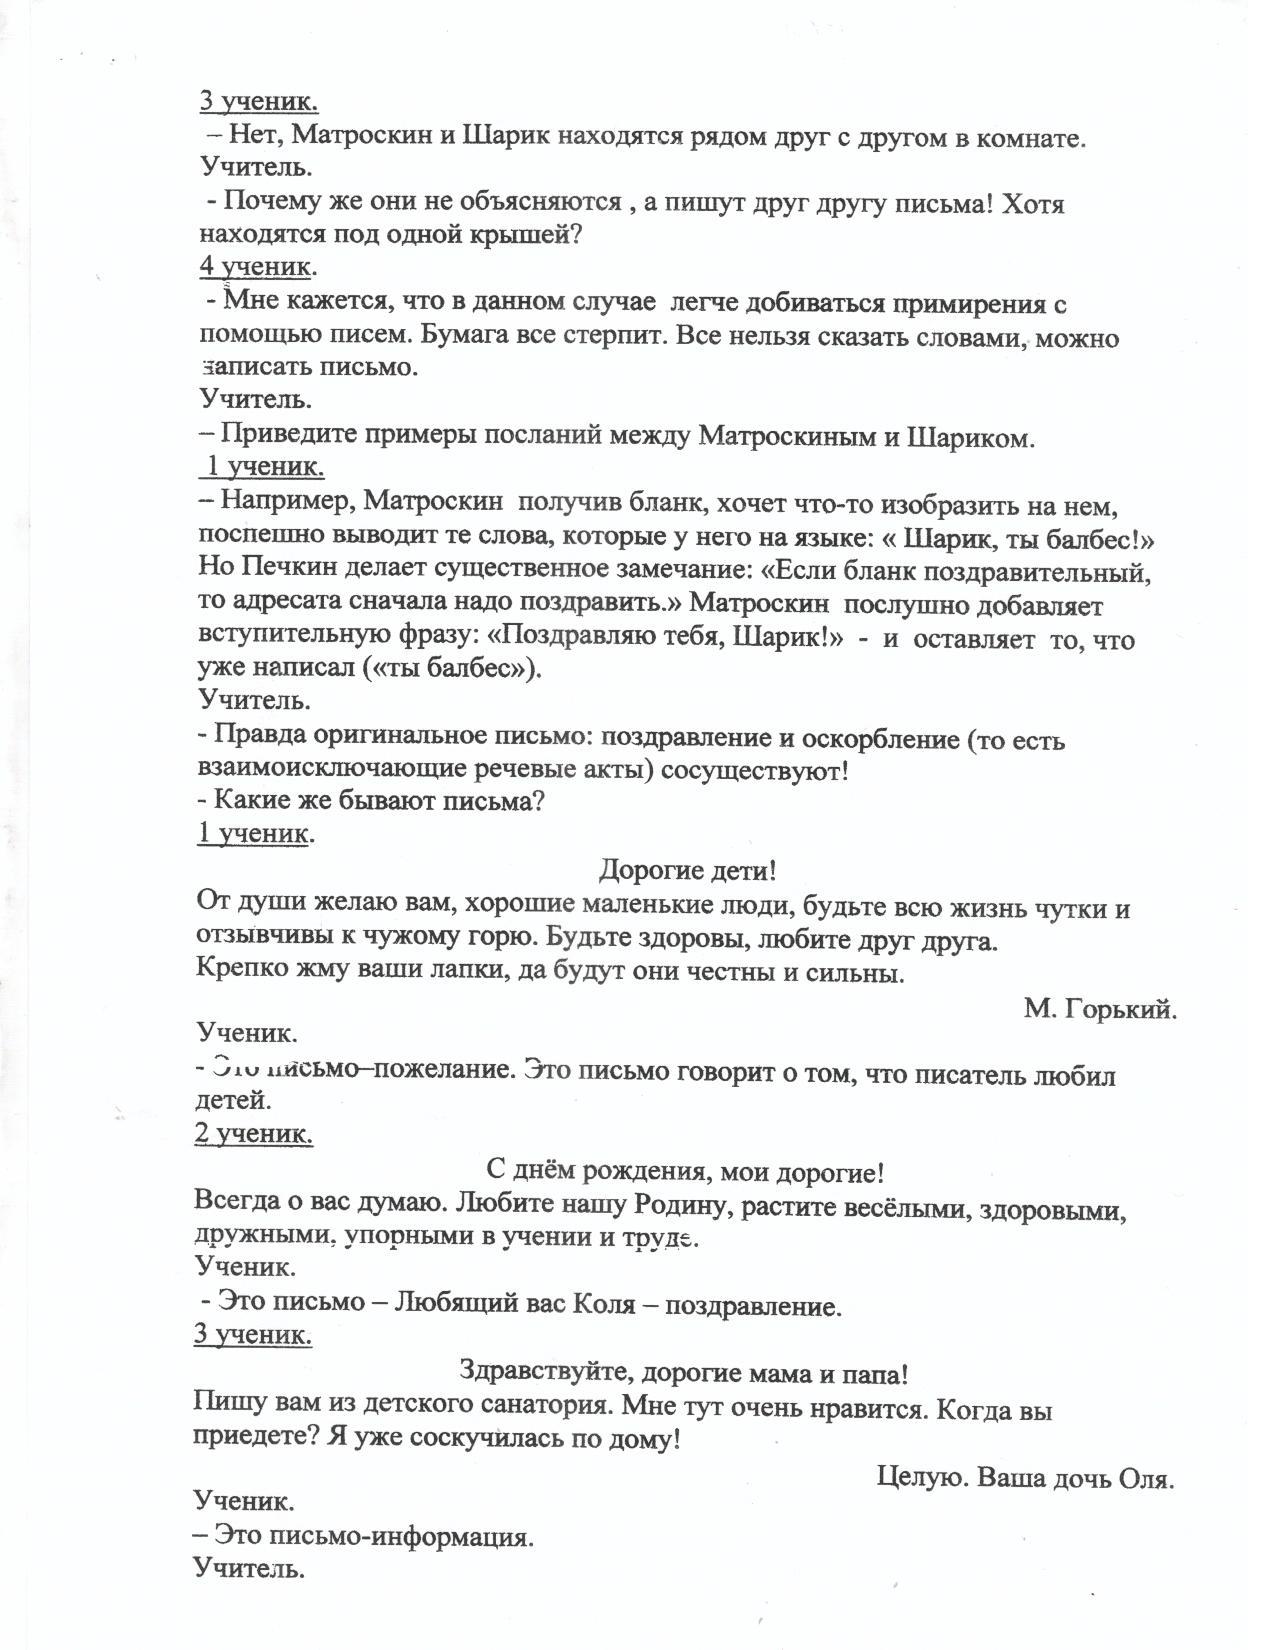 H:\сканер работ\Урок письма\стр4.jpg